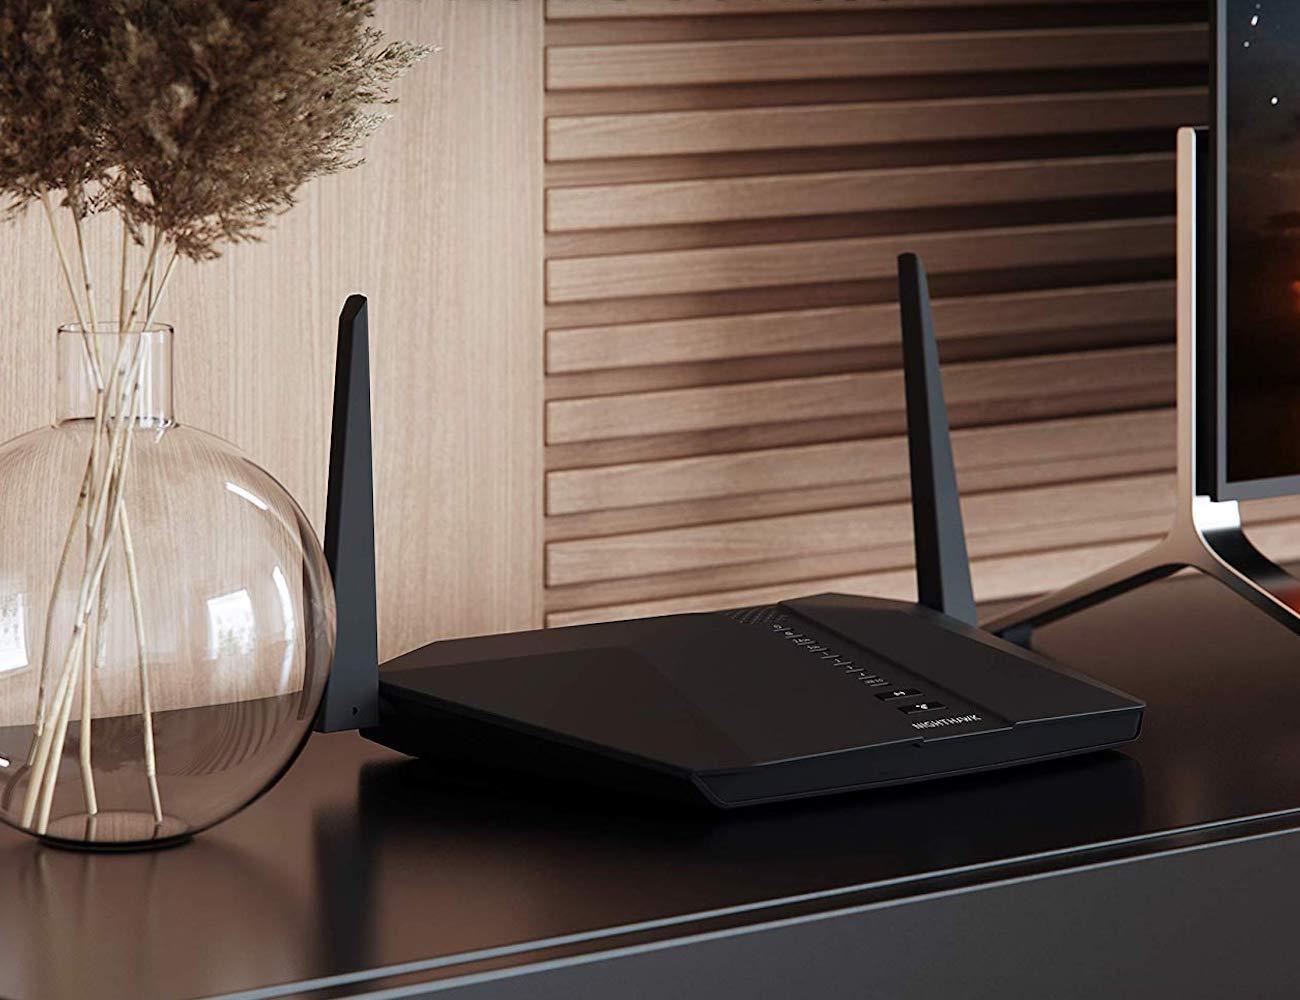 NETGEAR Nighthawk Wi-Fi 6 Router